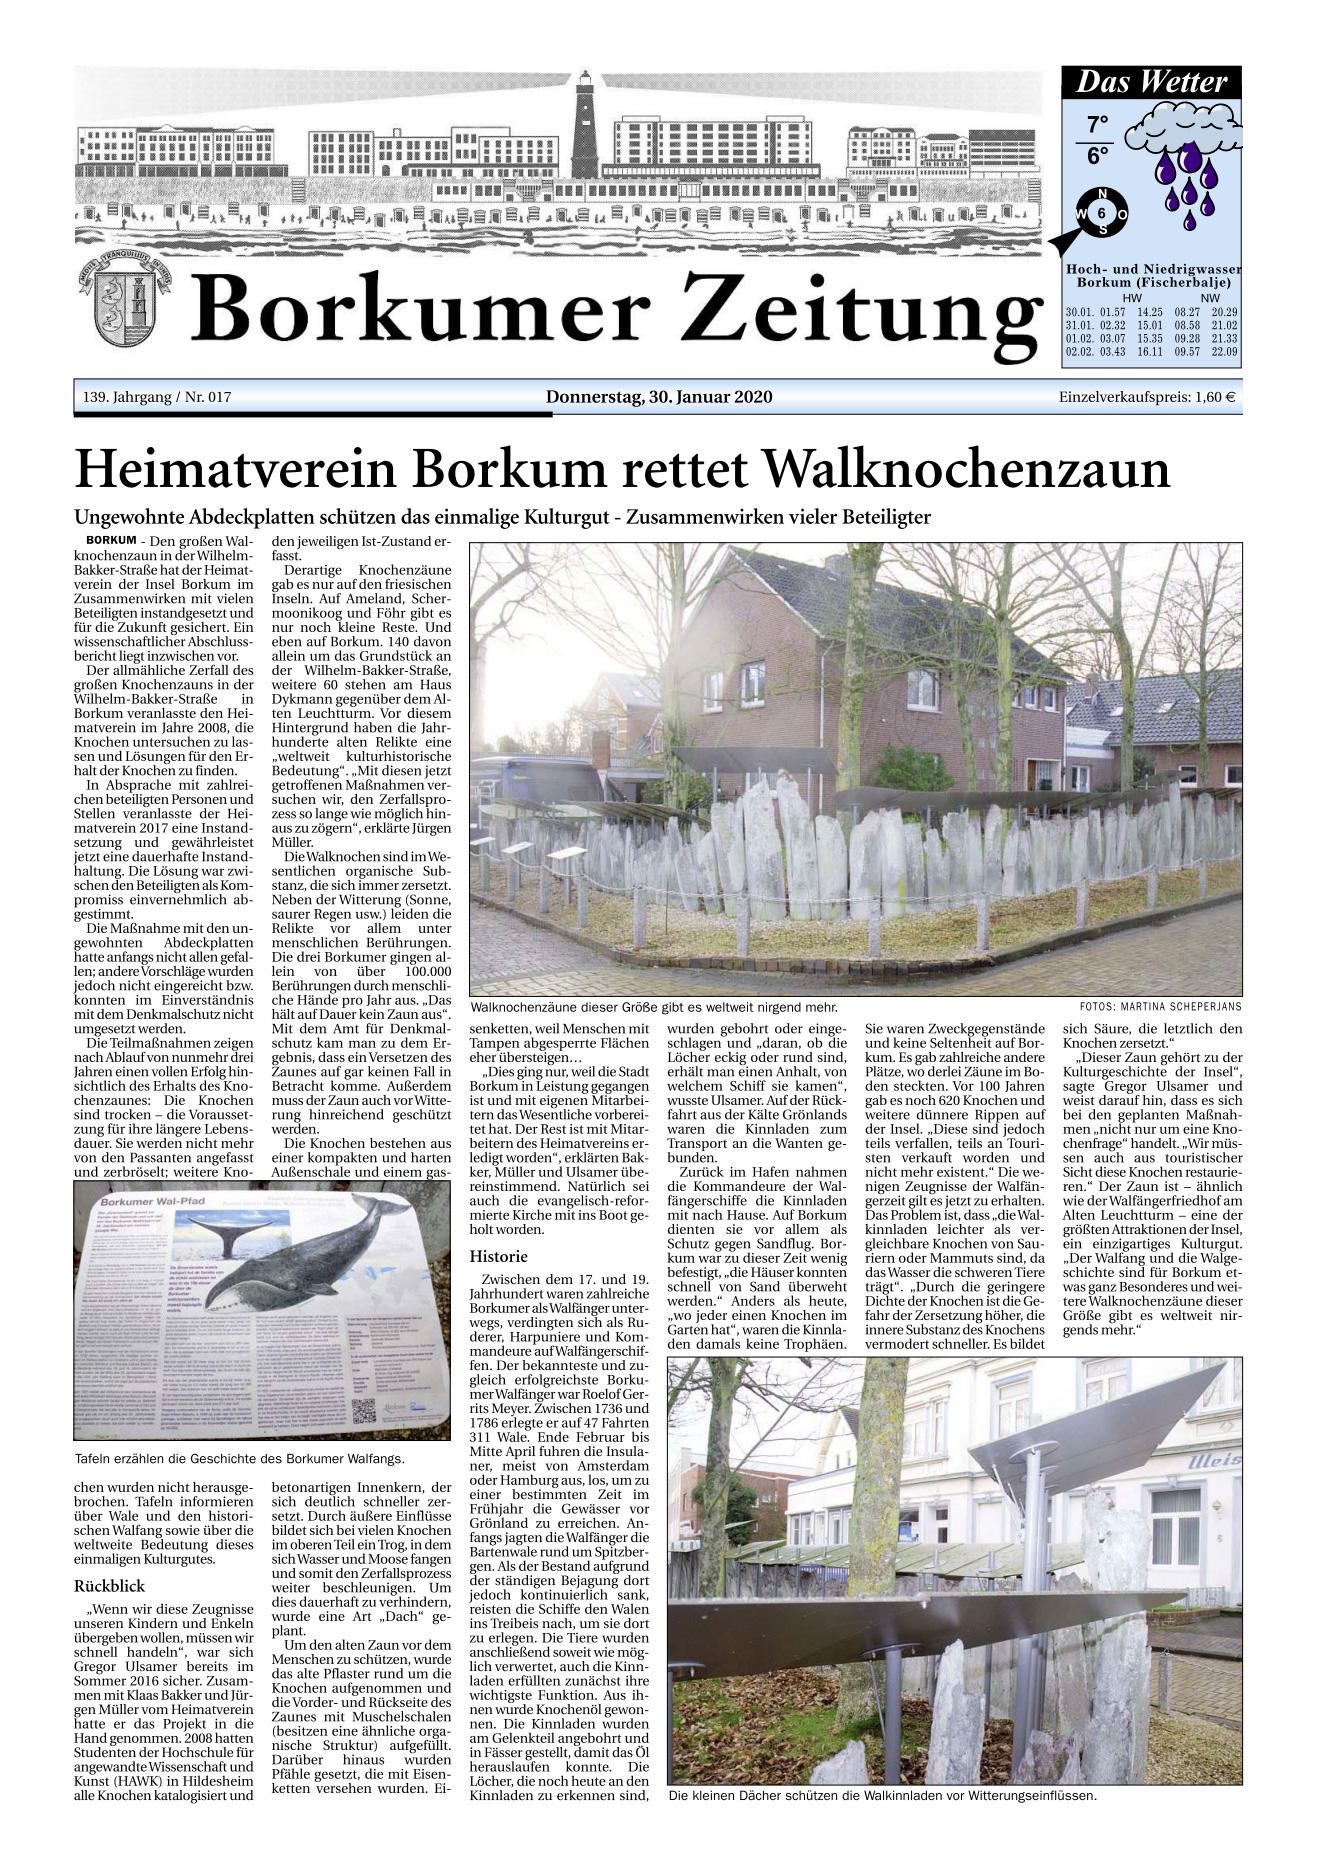 Heimatverein Borkum rettet Walknochenzaun